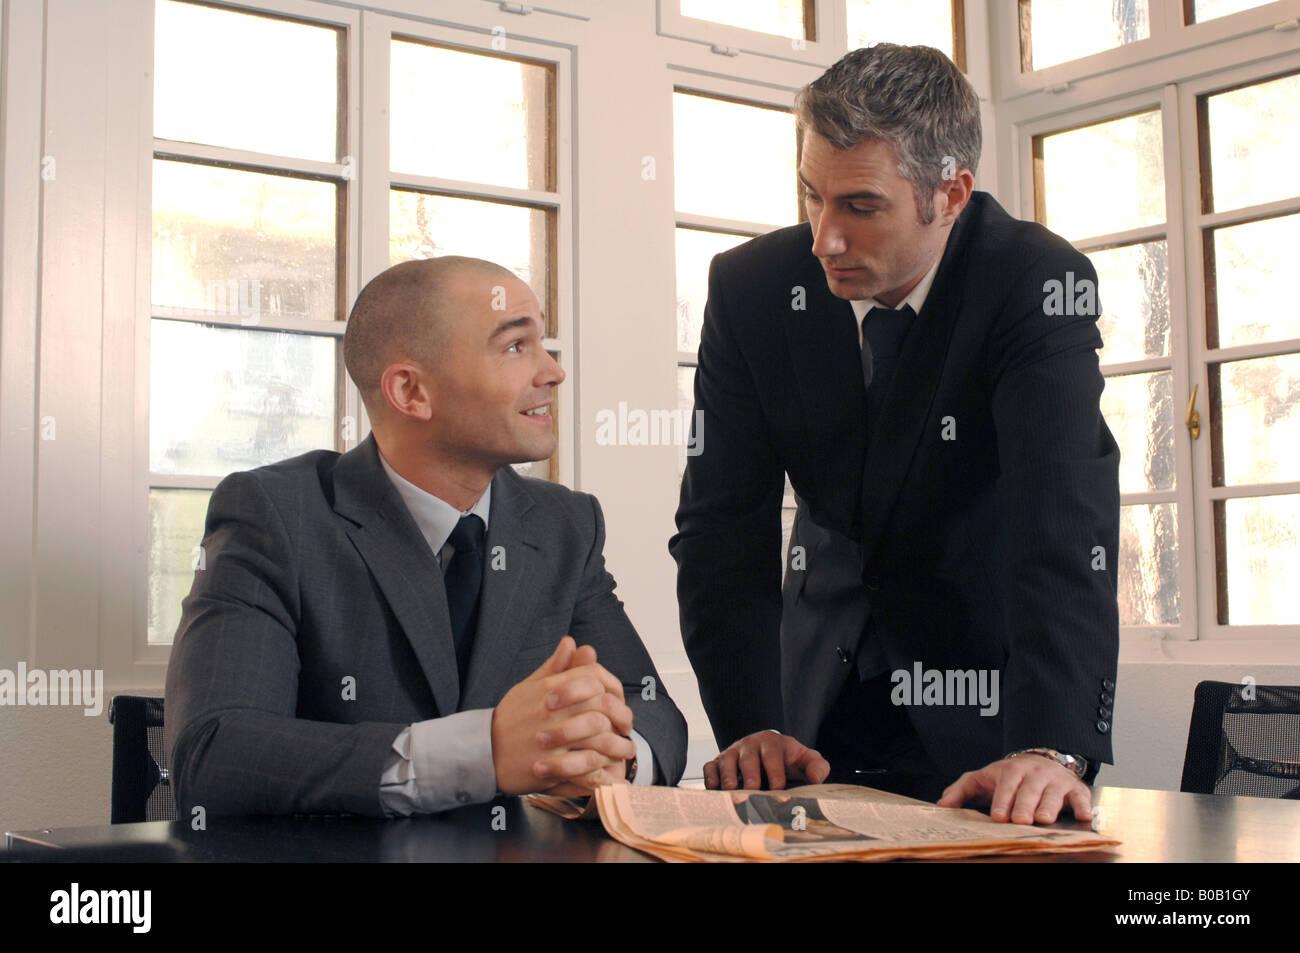 business men at work - Stock Image